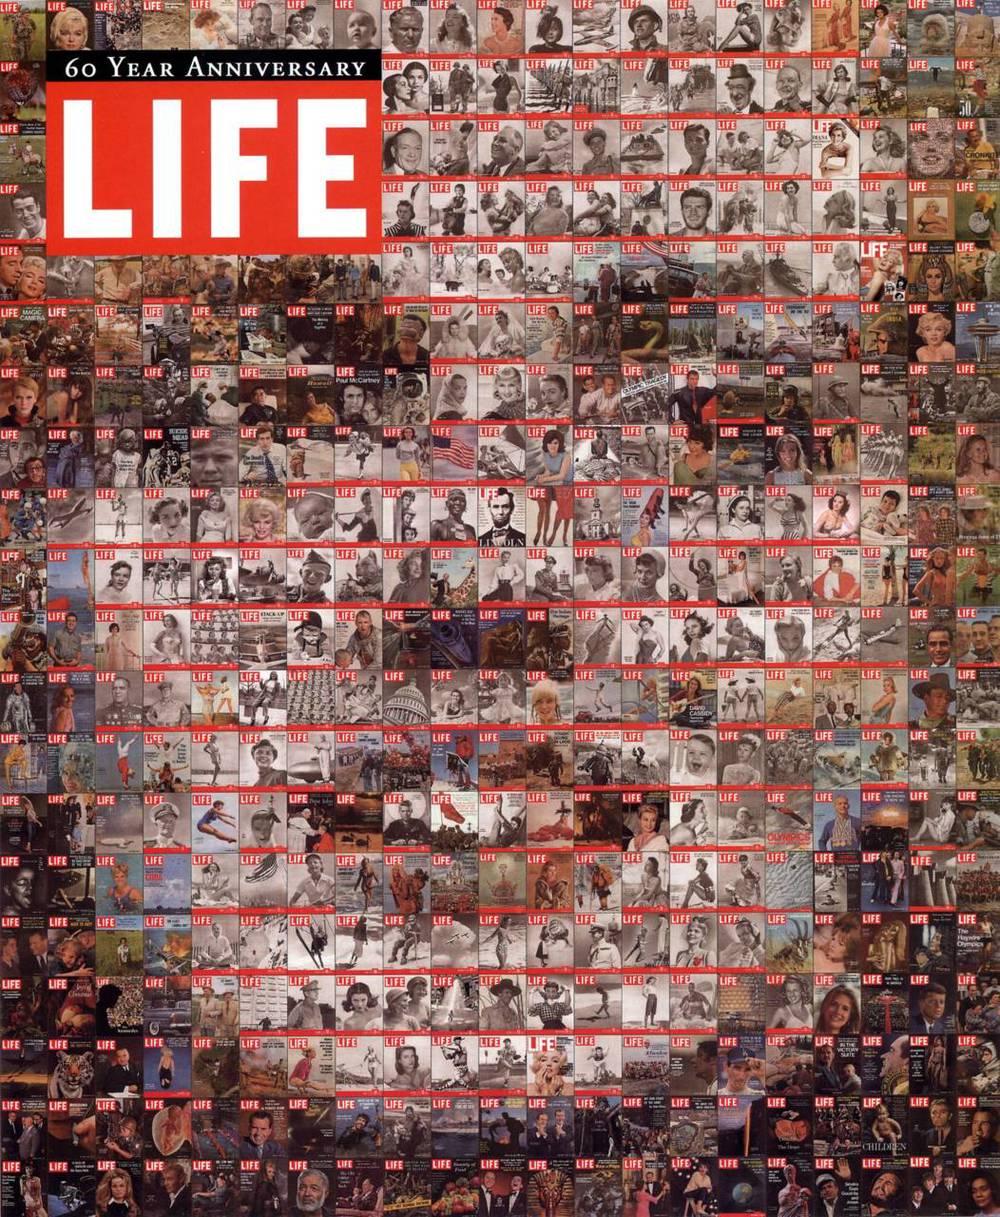 life-60-yr-anniv[1].jpg